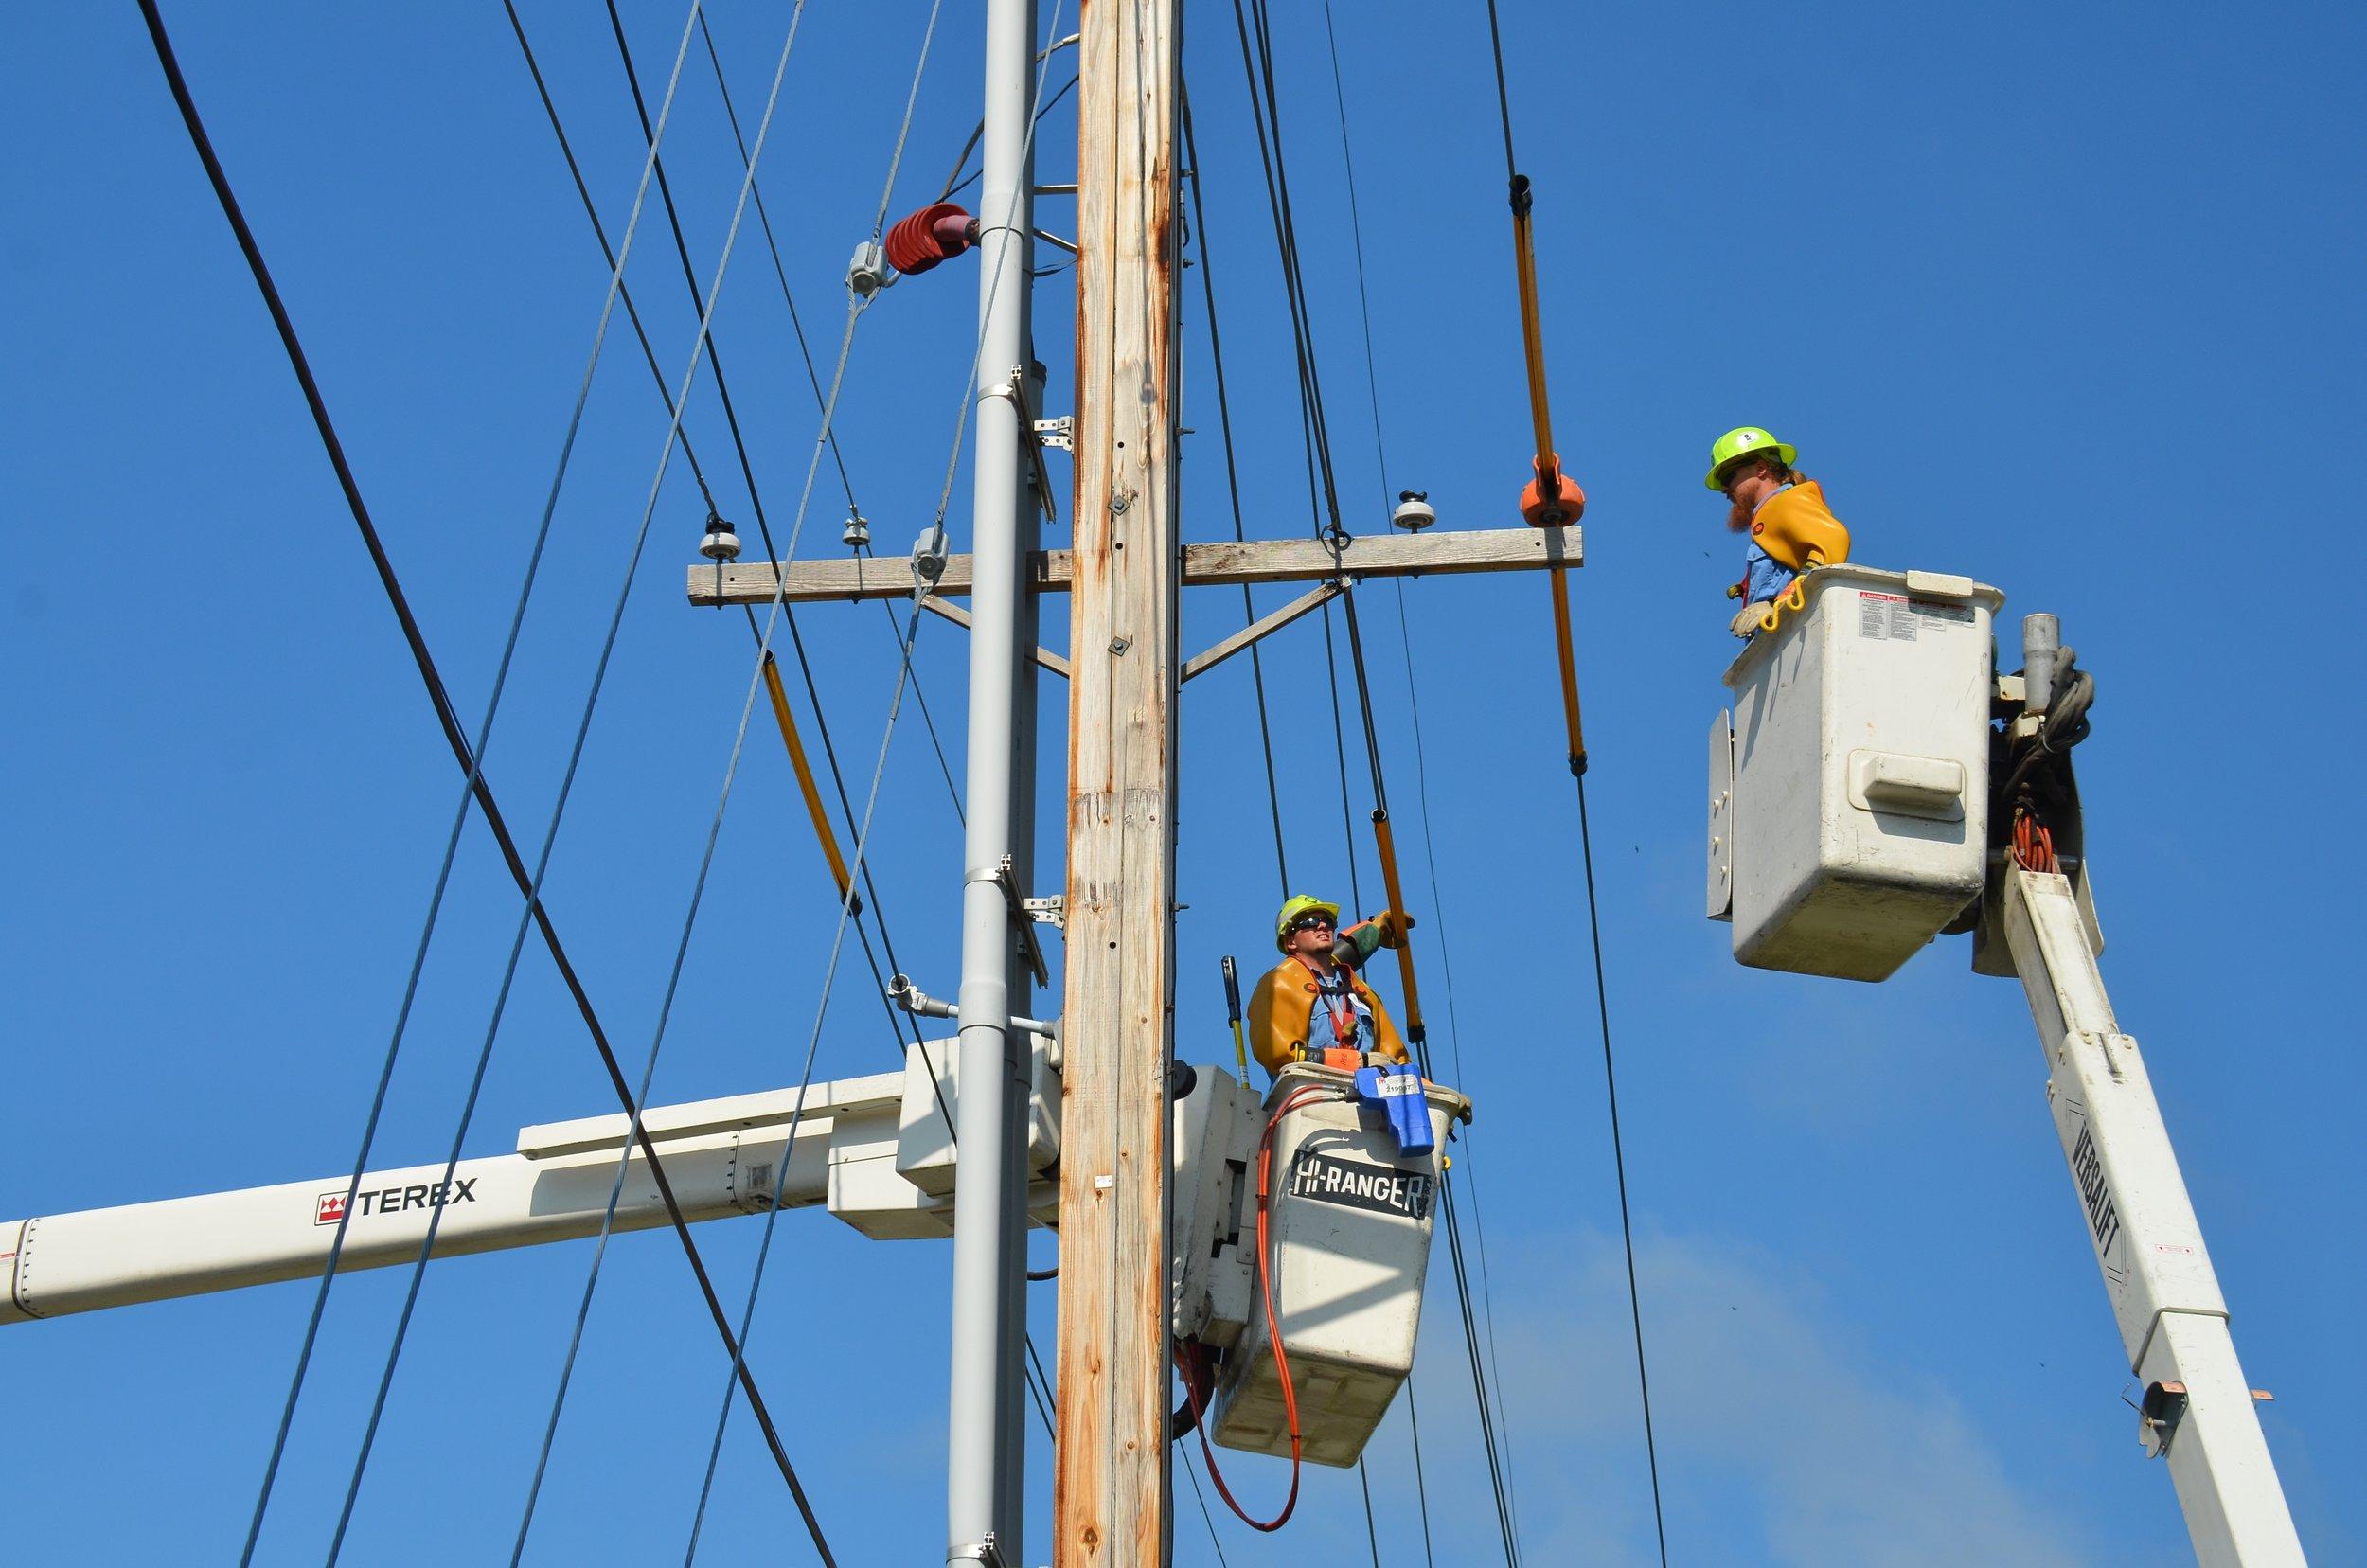 utilities american-public-power-association-430858-unsplash.jpg